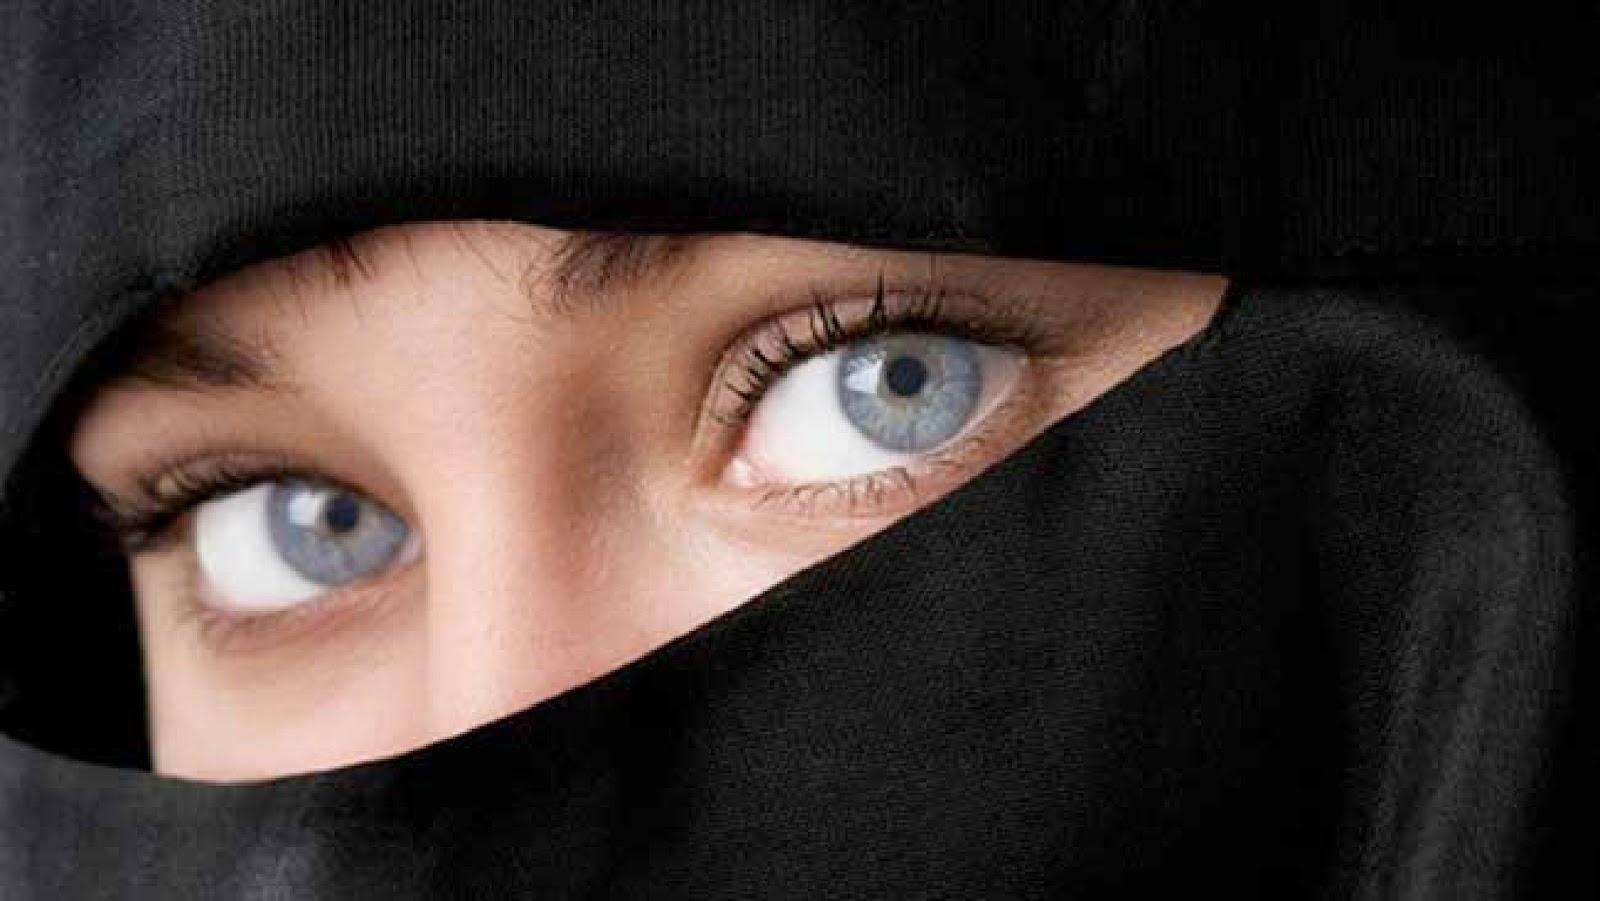 Burka Beautiful Eyes Hd Wallpaper - Beautiful Eyes In Burkha , HD Wallpaper & Backgrounds